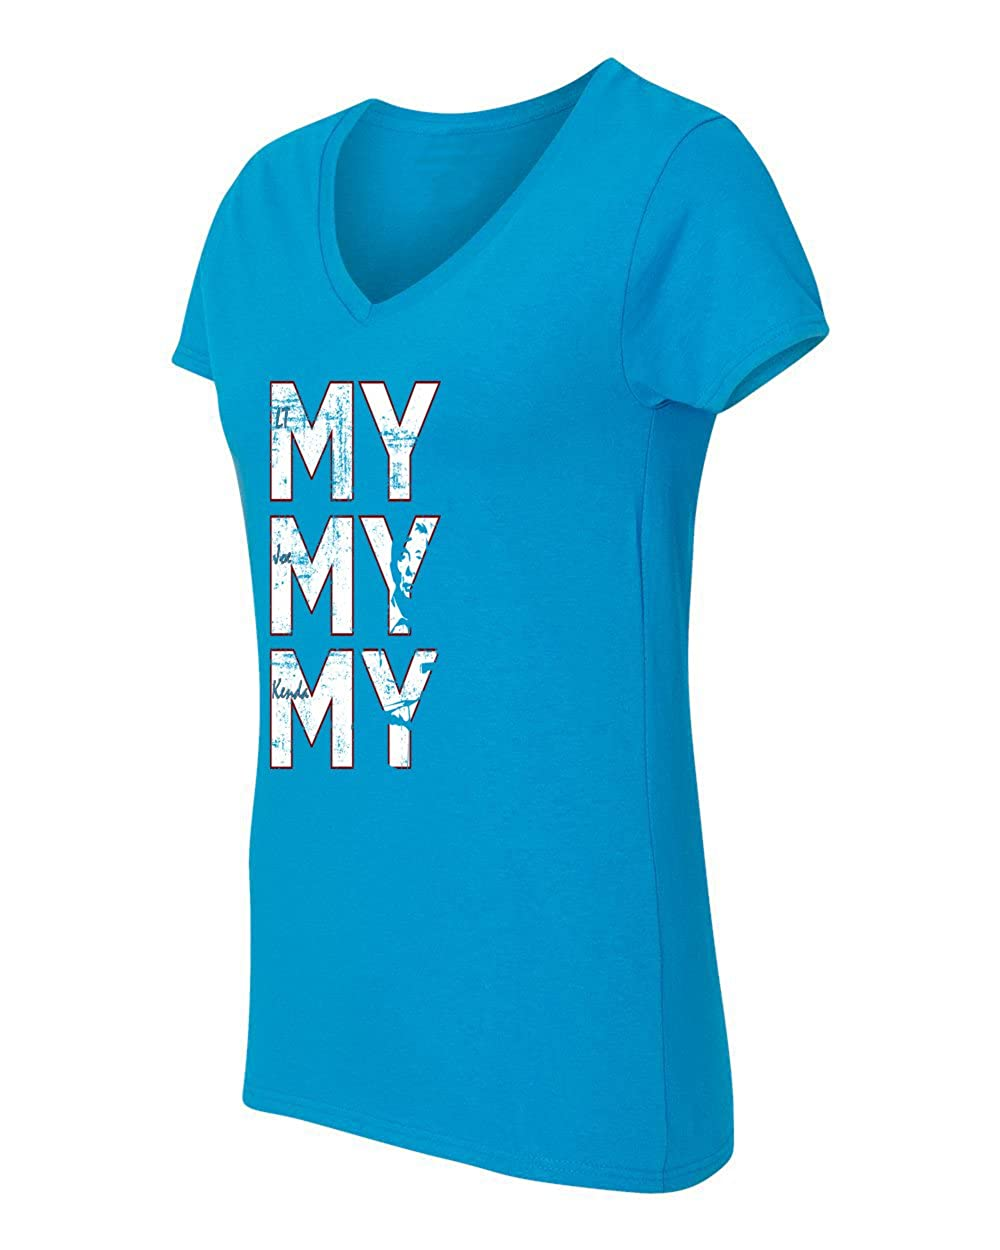 5c3b125498cfa Amazon.com  My LT. Joe Kenda - Tv Show Womens Vneck T-Shirt  Clothing